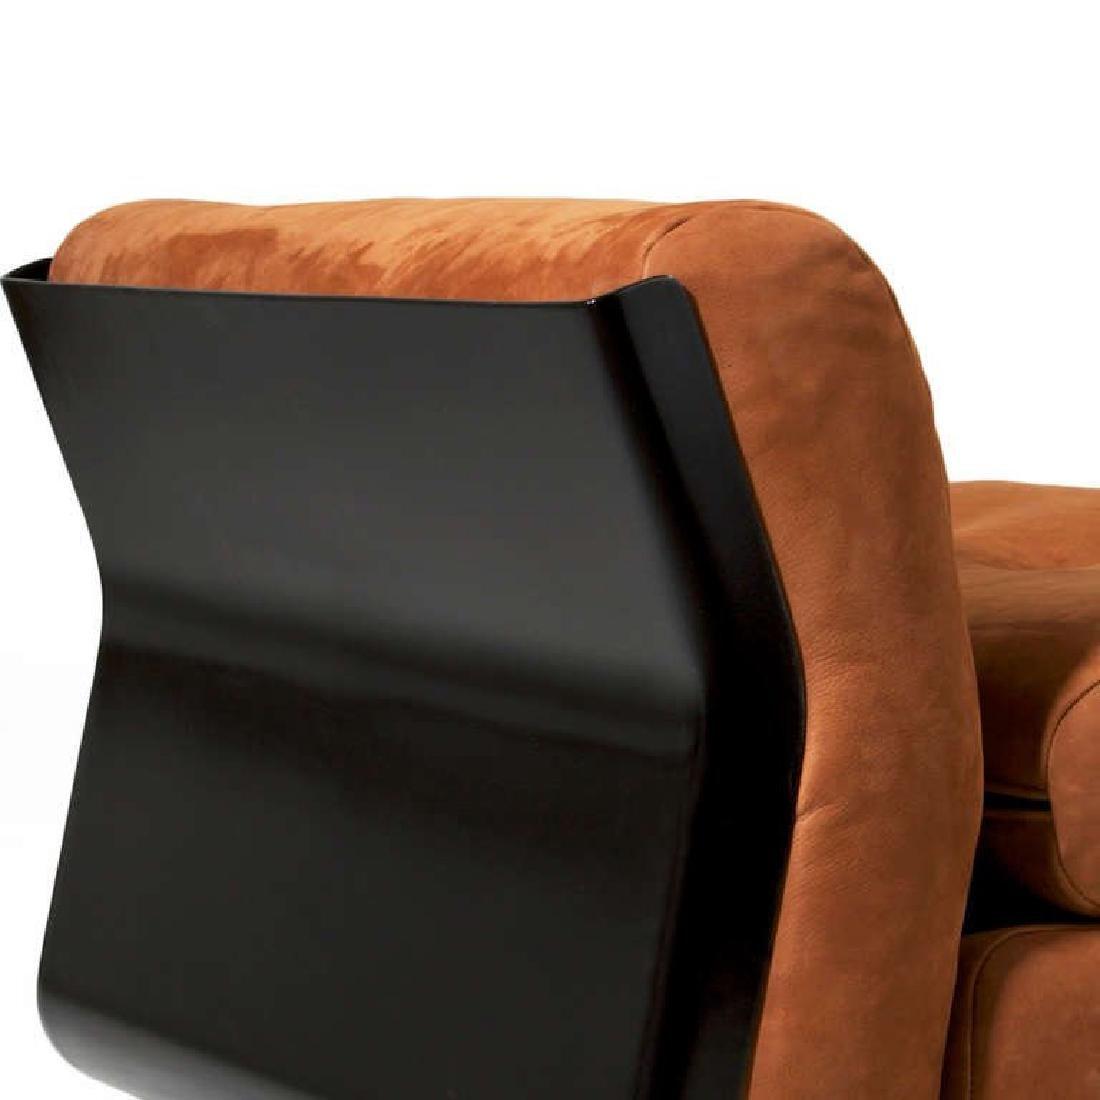 Mario Bellini Amanta Chairs (2) - 4